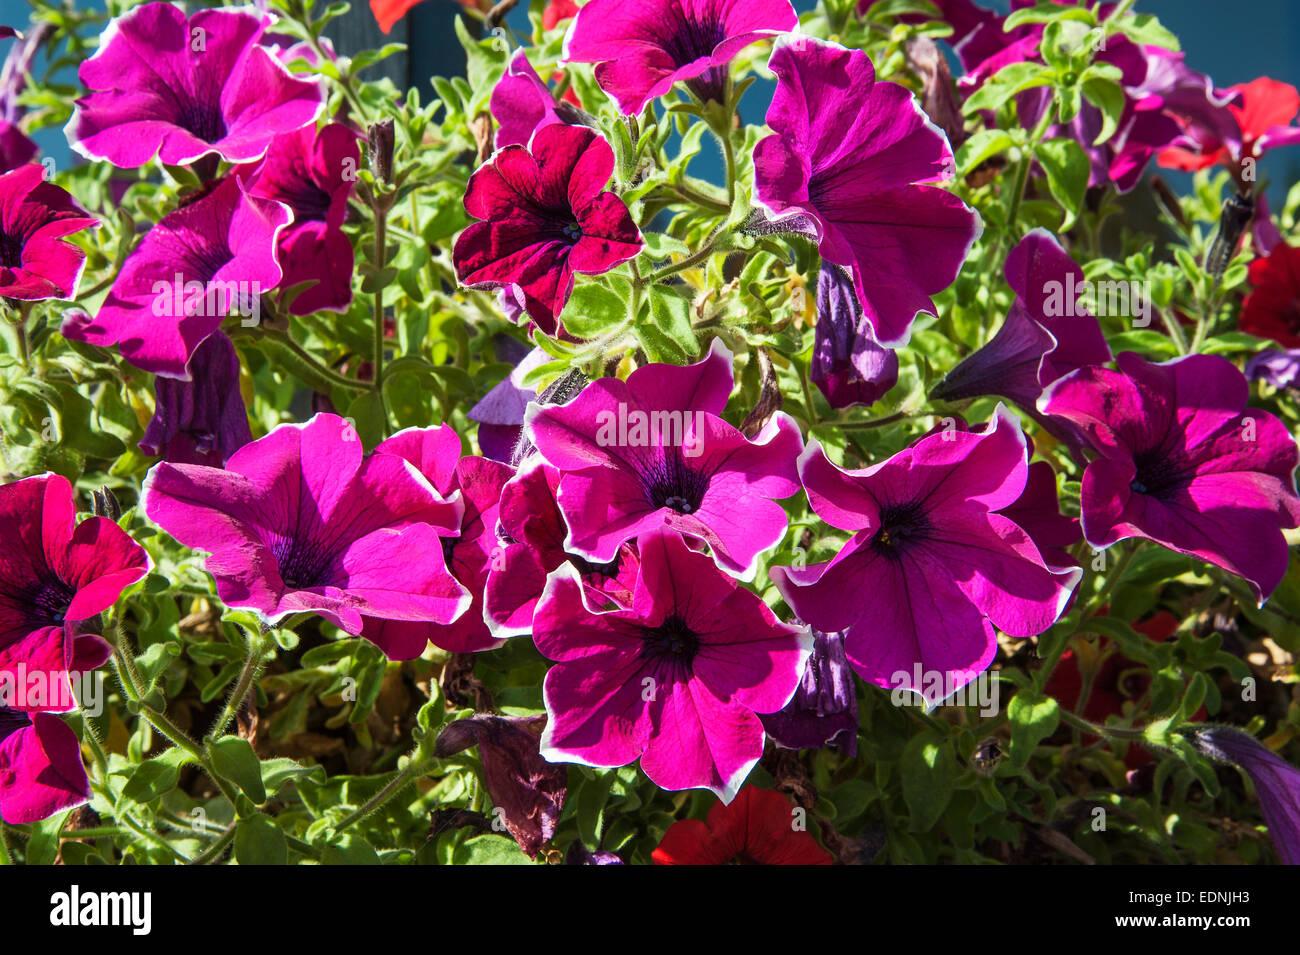 Petunia (Petunia x hybrid), Germany - Stock Image